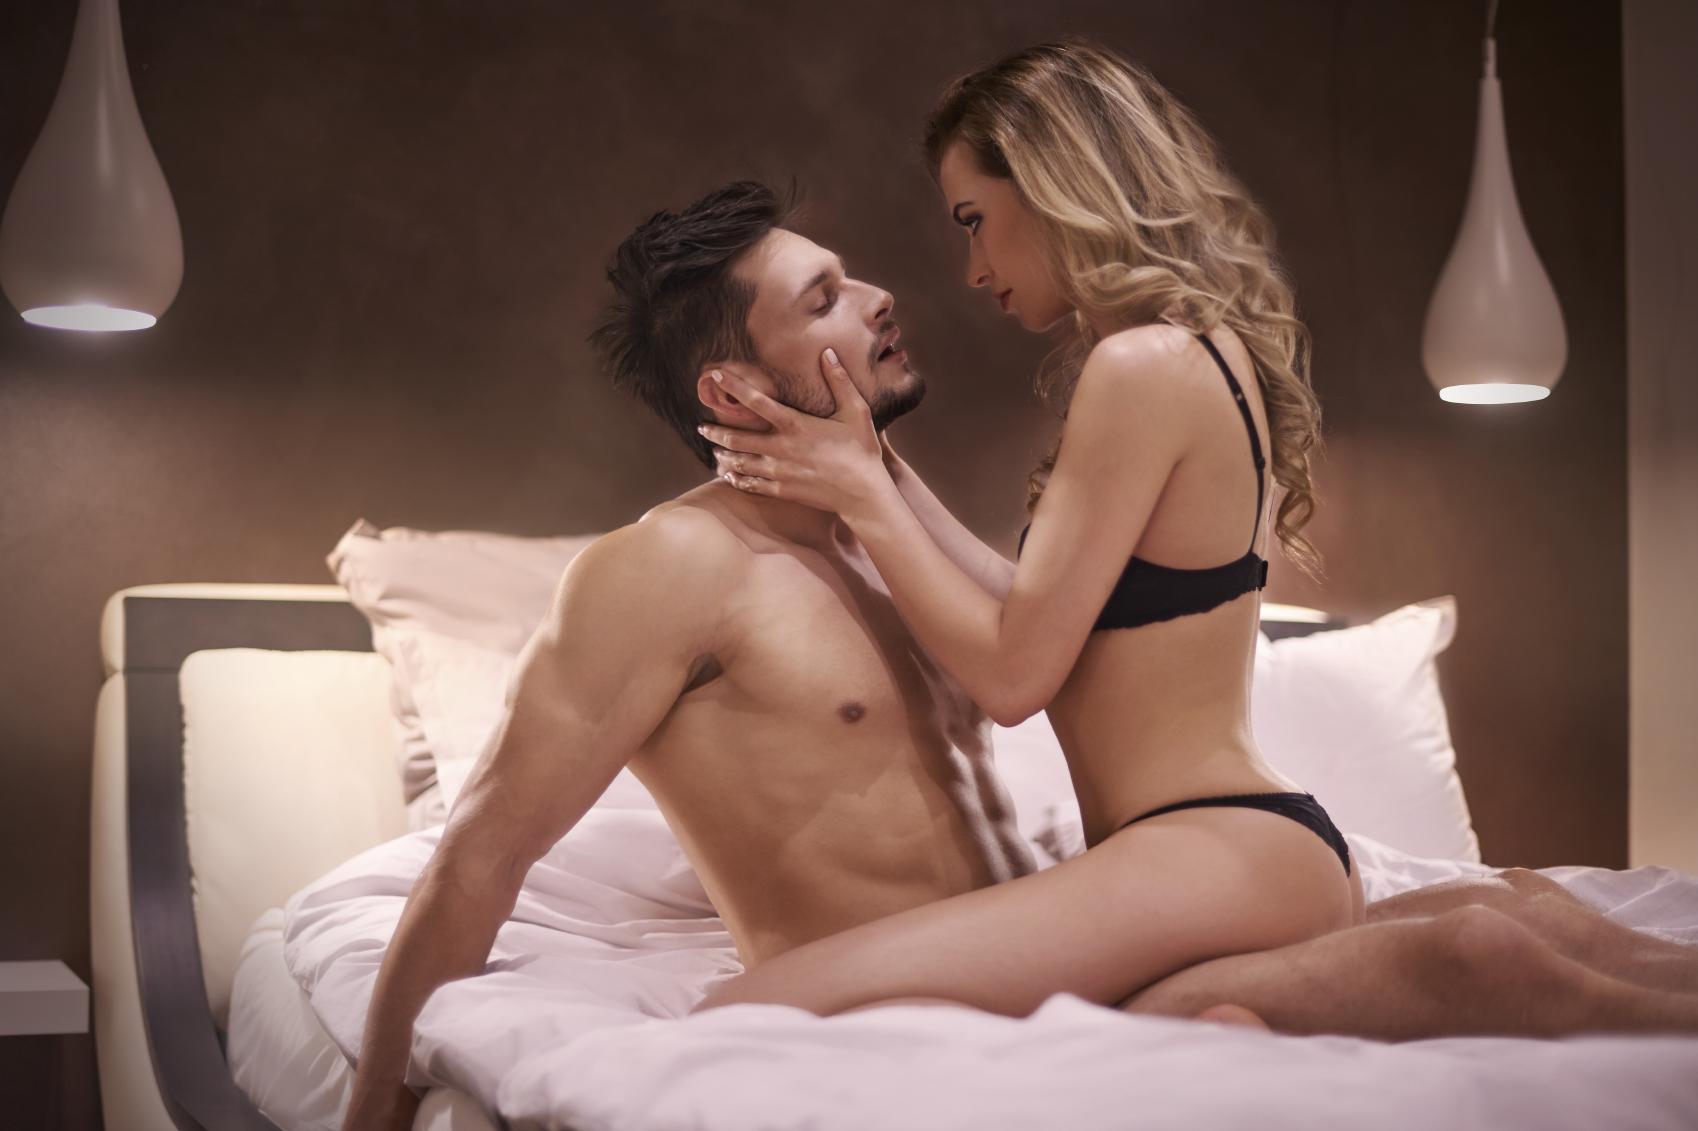 Yours paradise lahti web cam sex